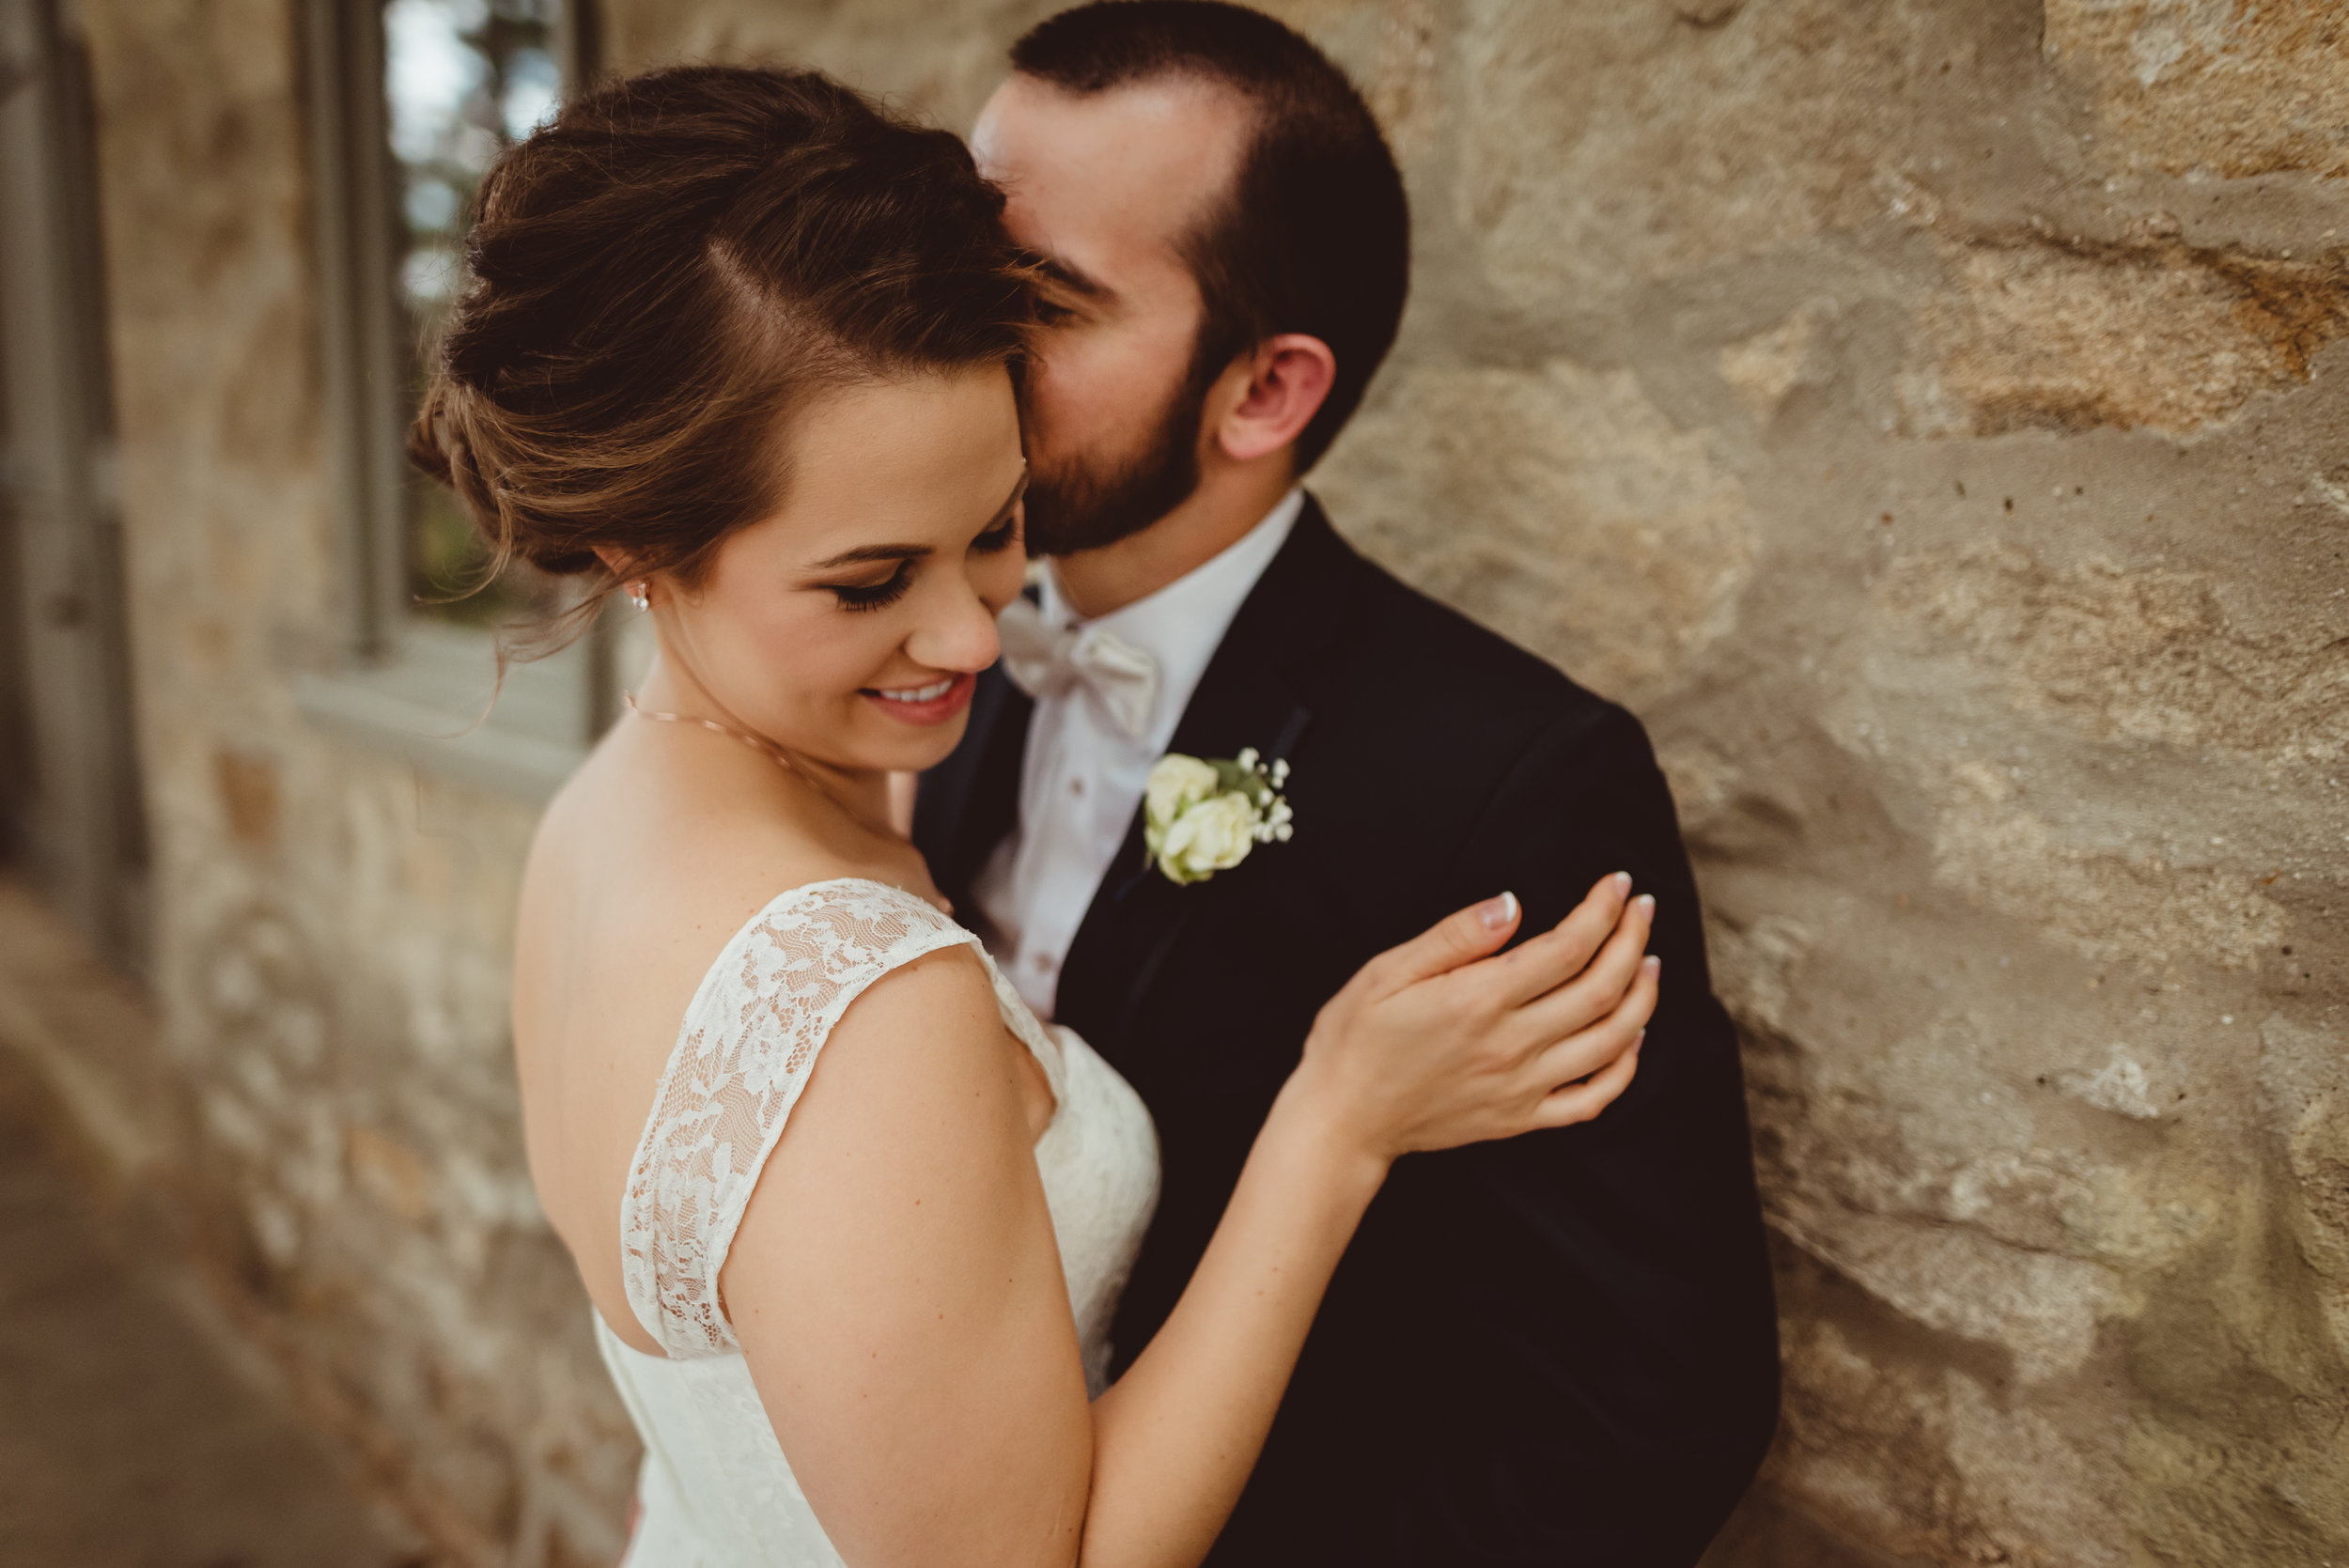 brittney-nestle-wedding-photography-olivers-carriage-house-behnke.jpg